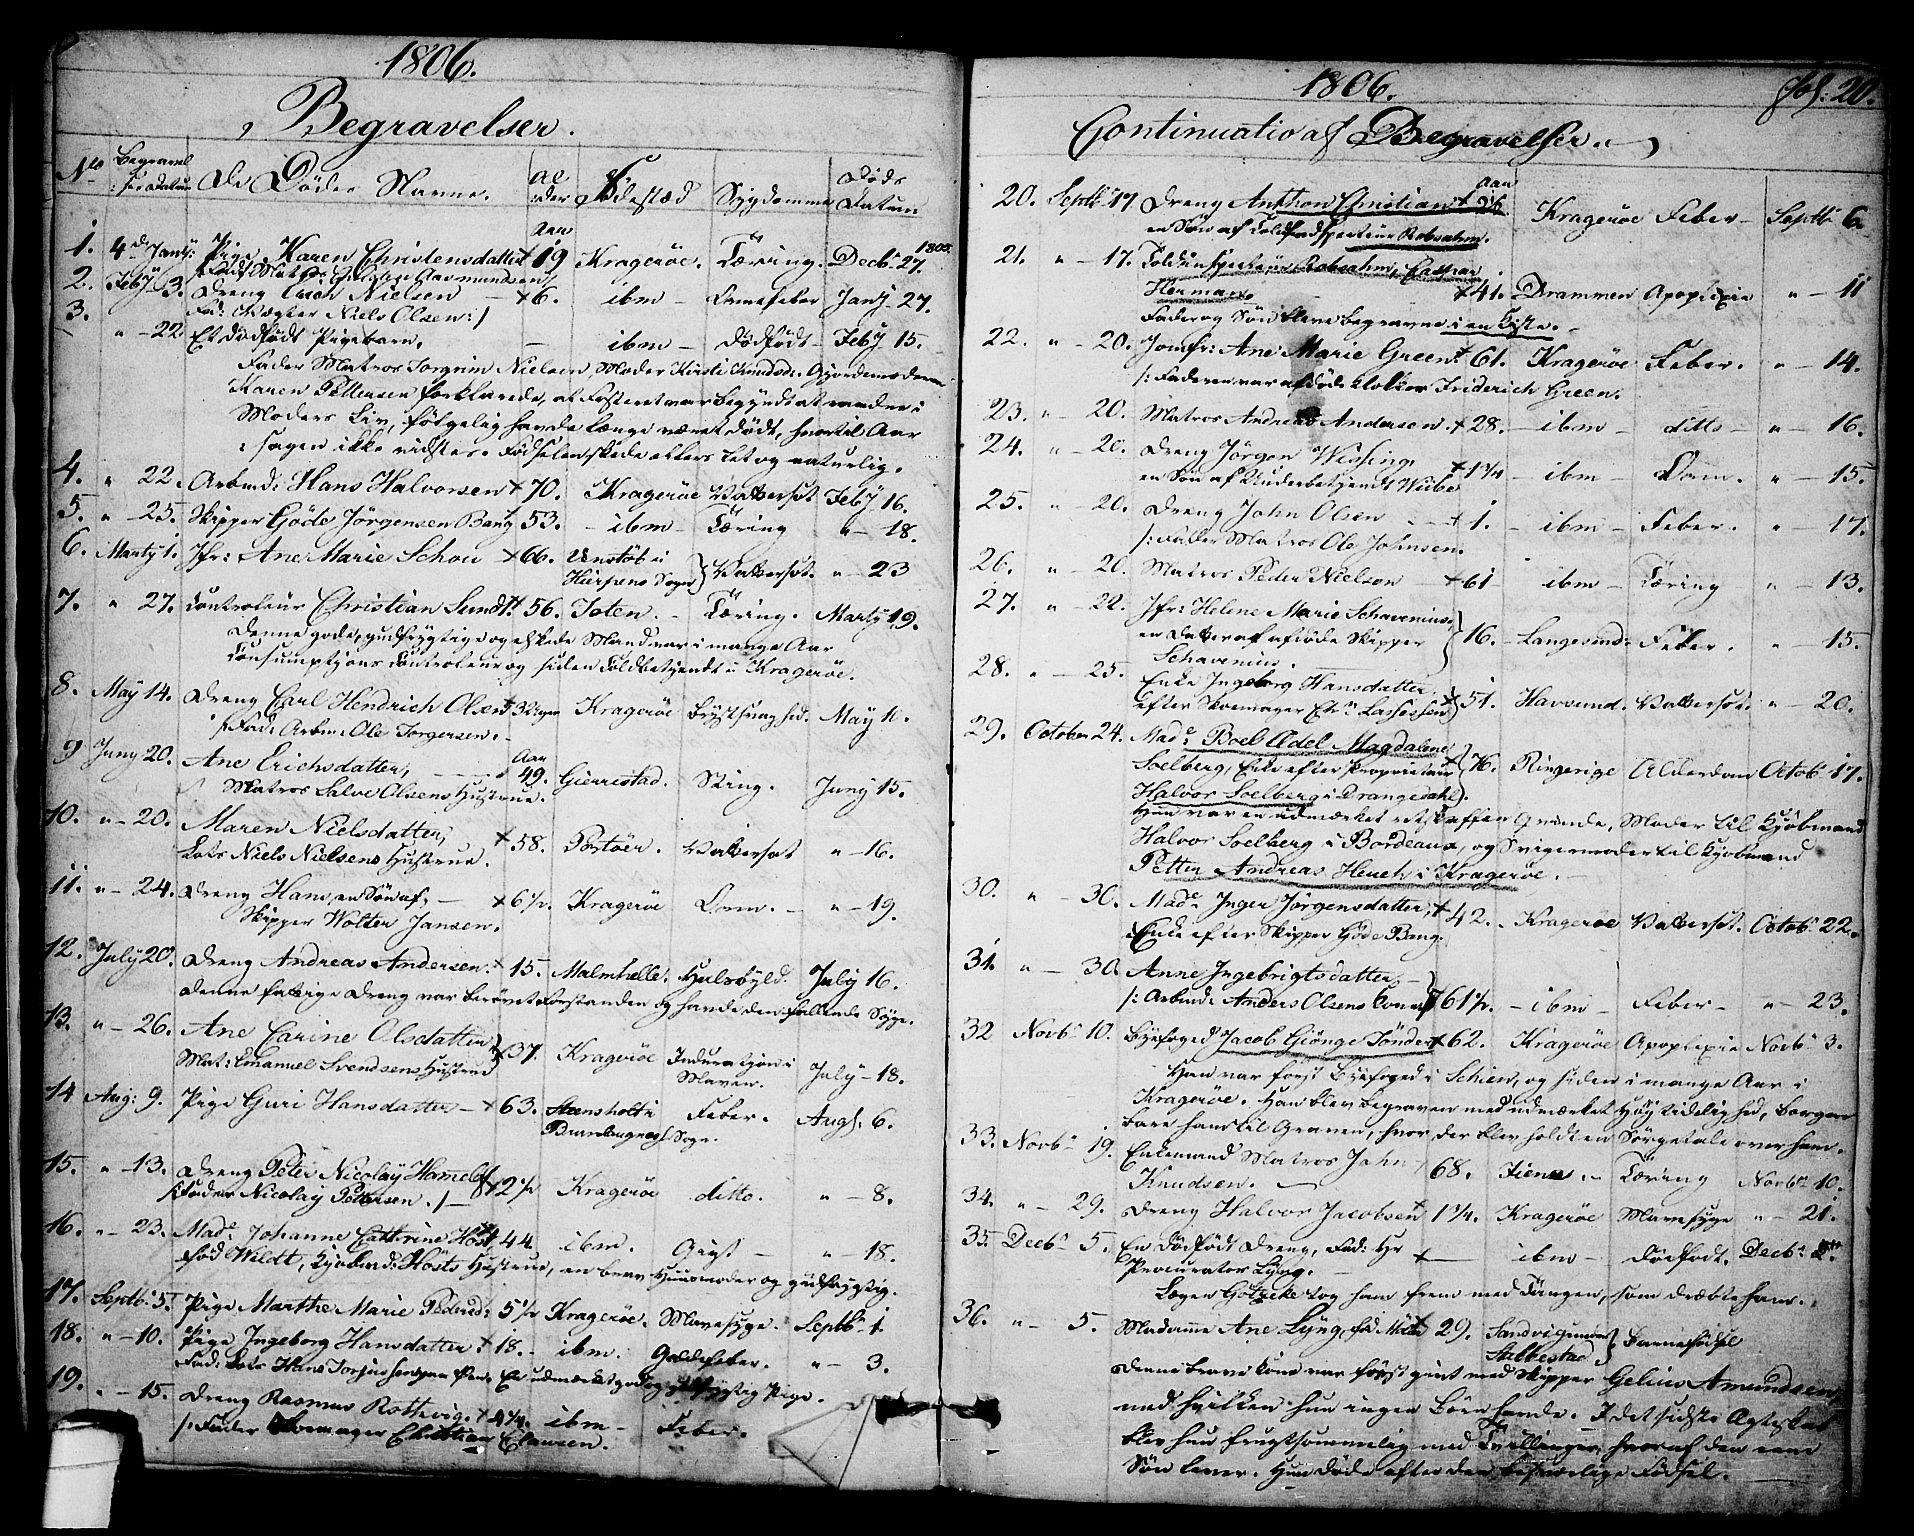 SAKO, Kragerø kirkebøker, F/Fa/L0003: Ministerialbok nr. 3, 1802-1813, s. 20